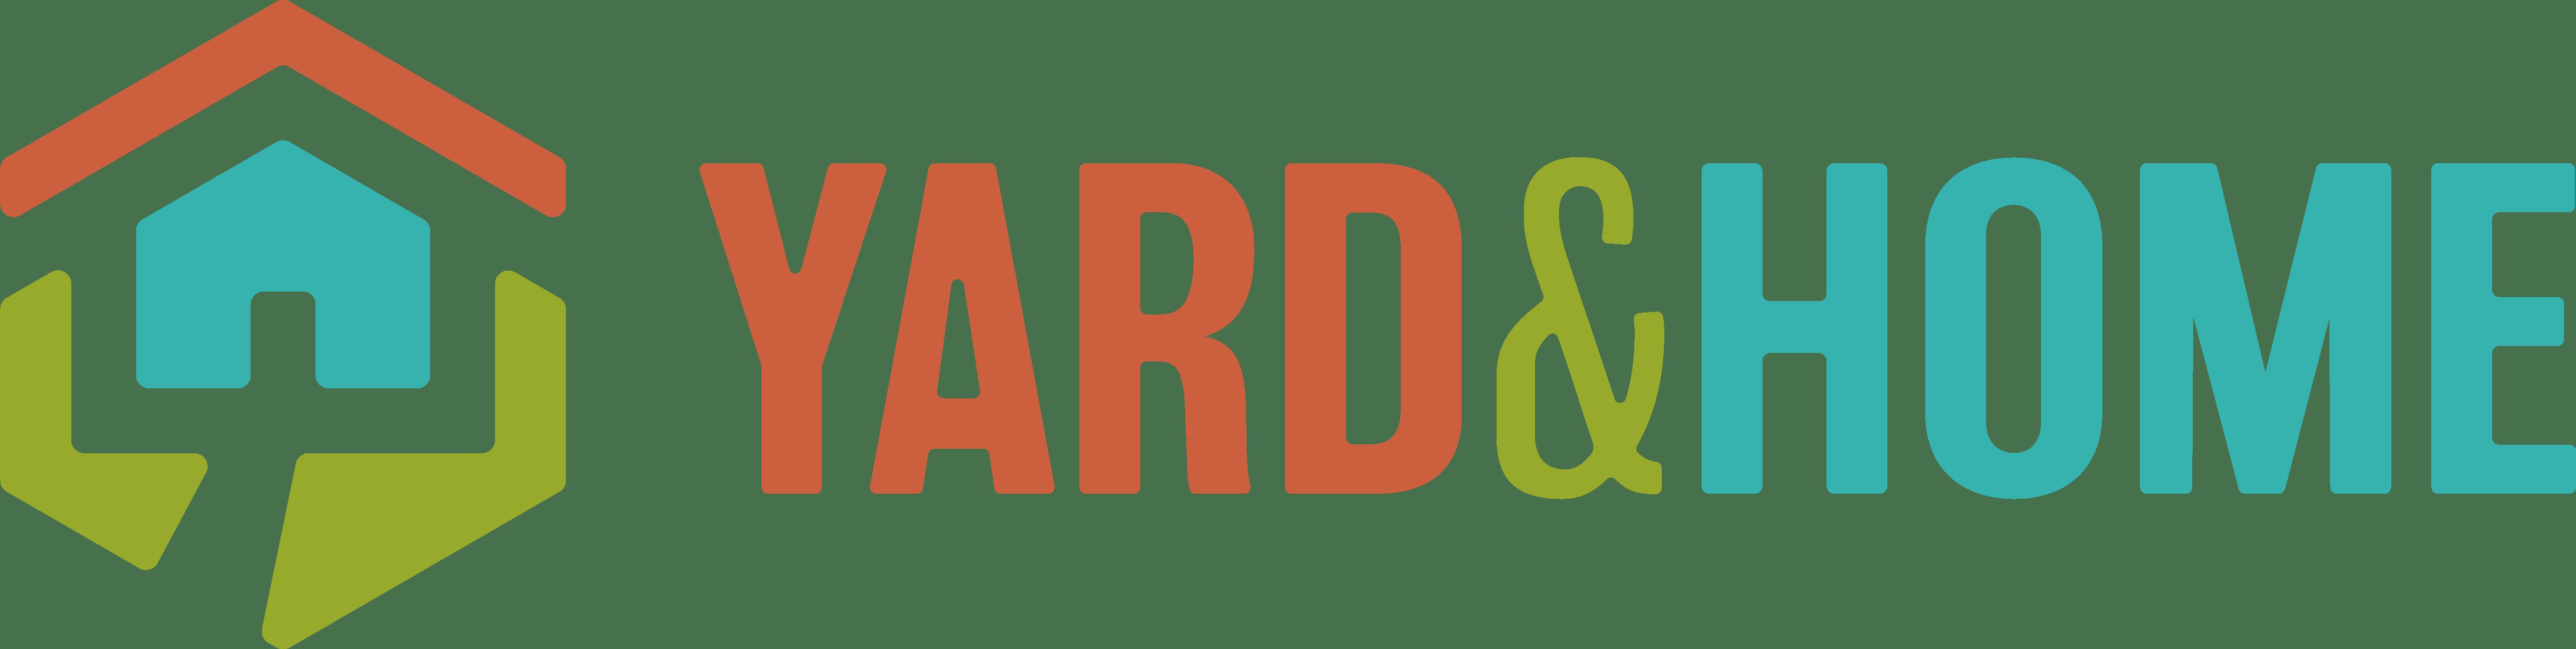 Yard & Home